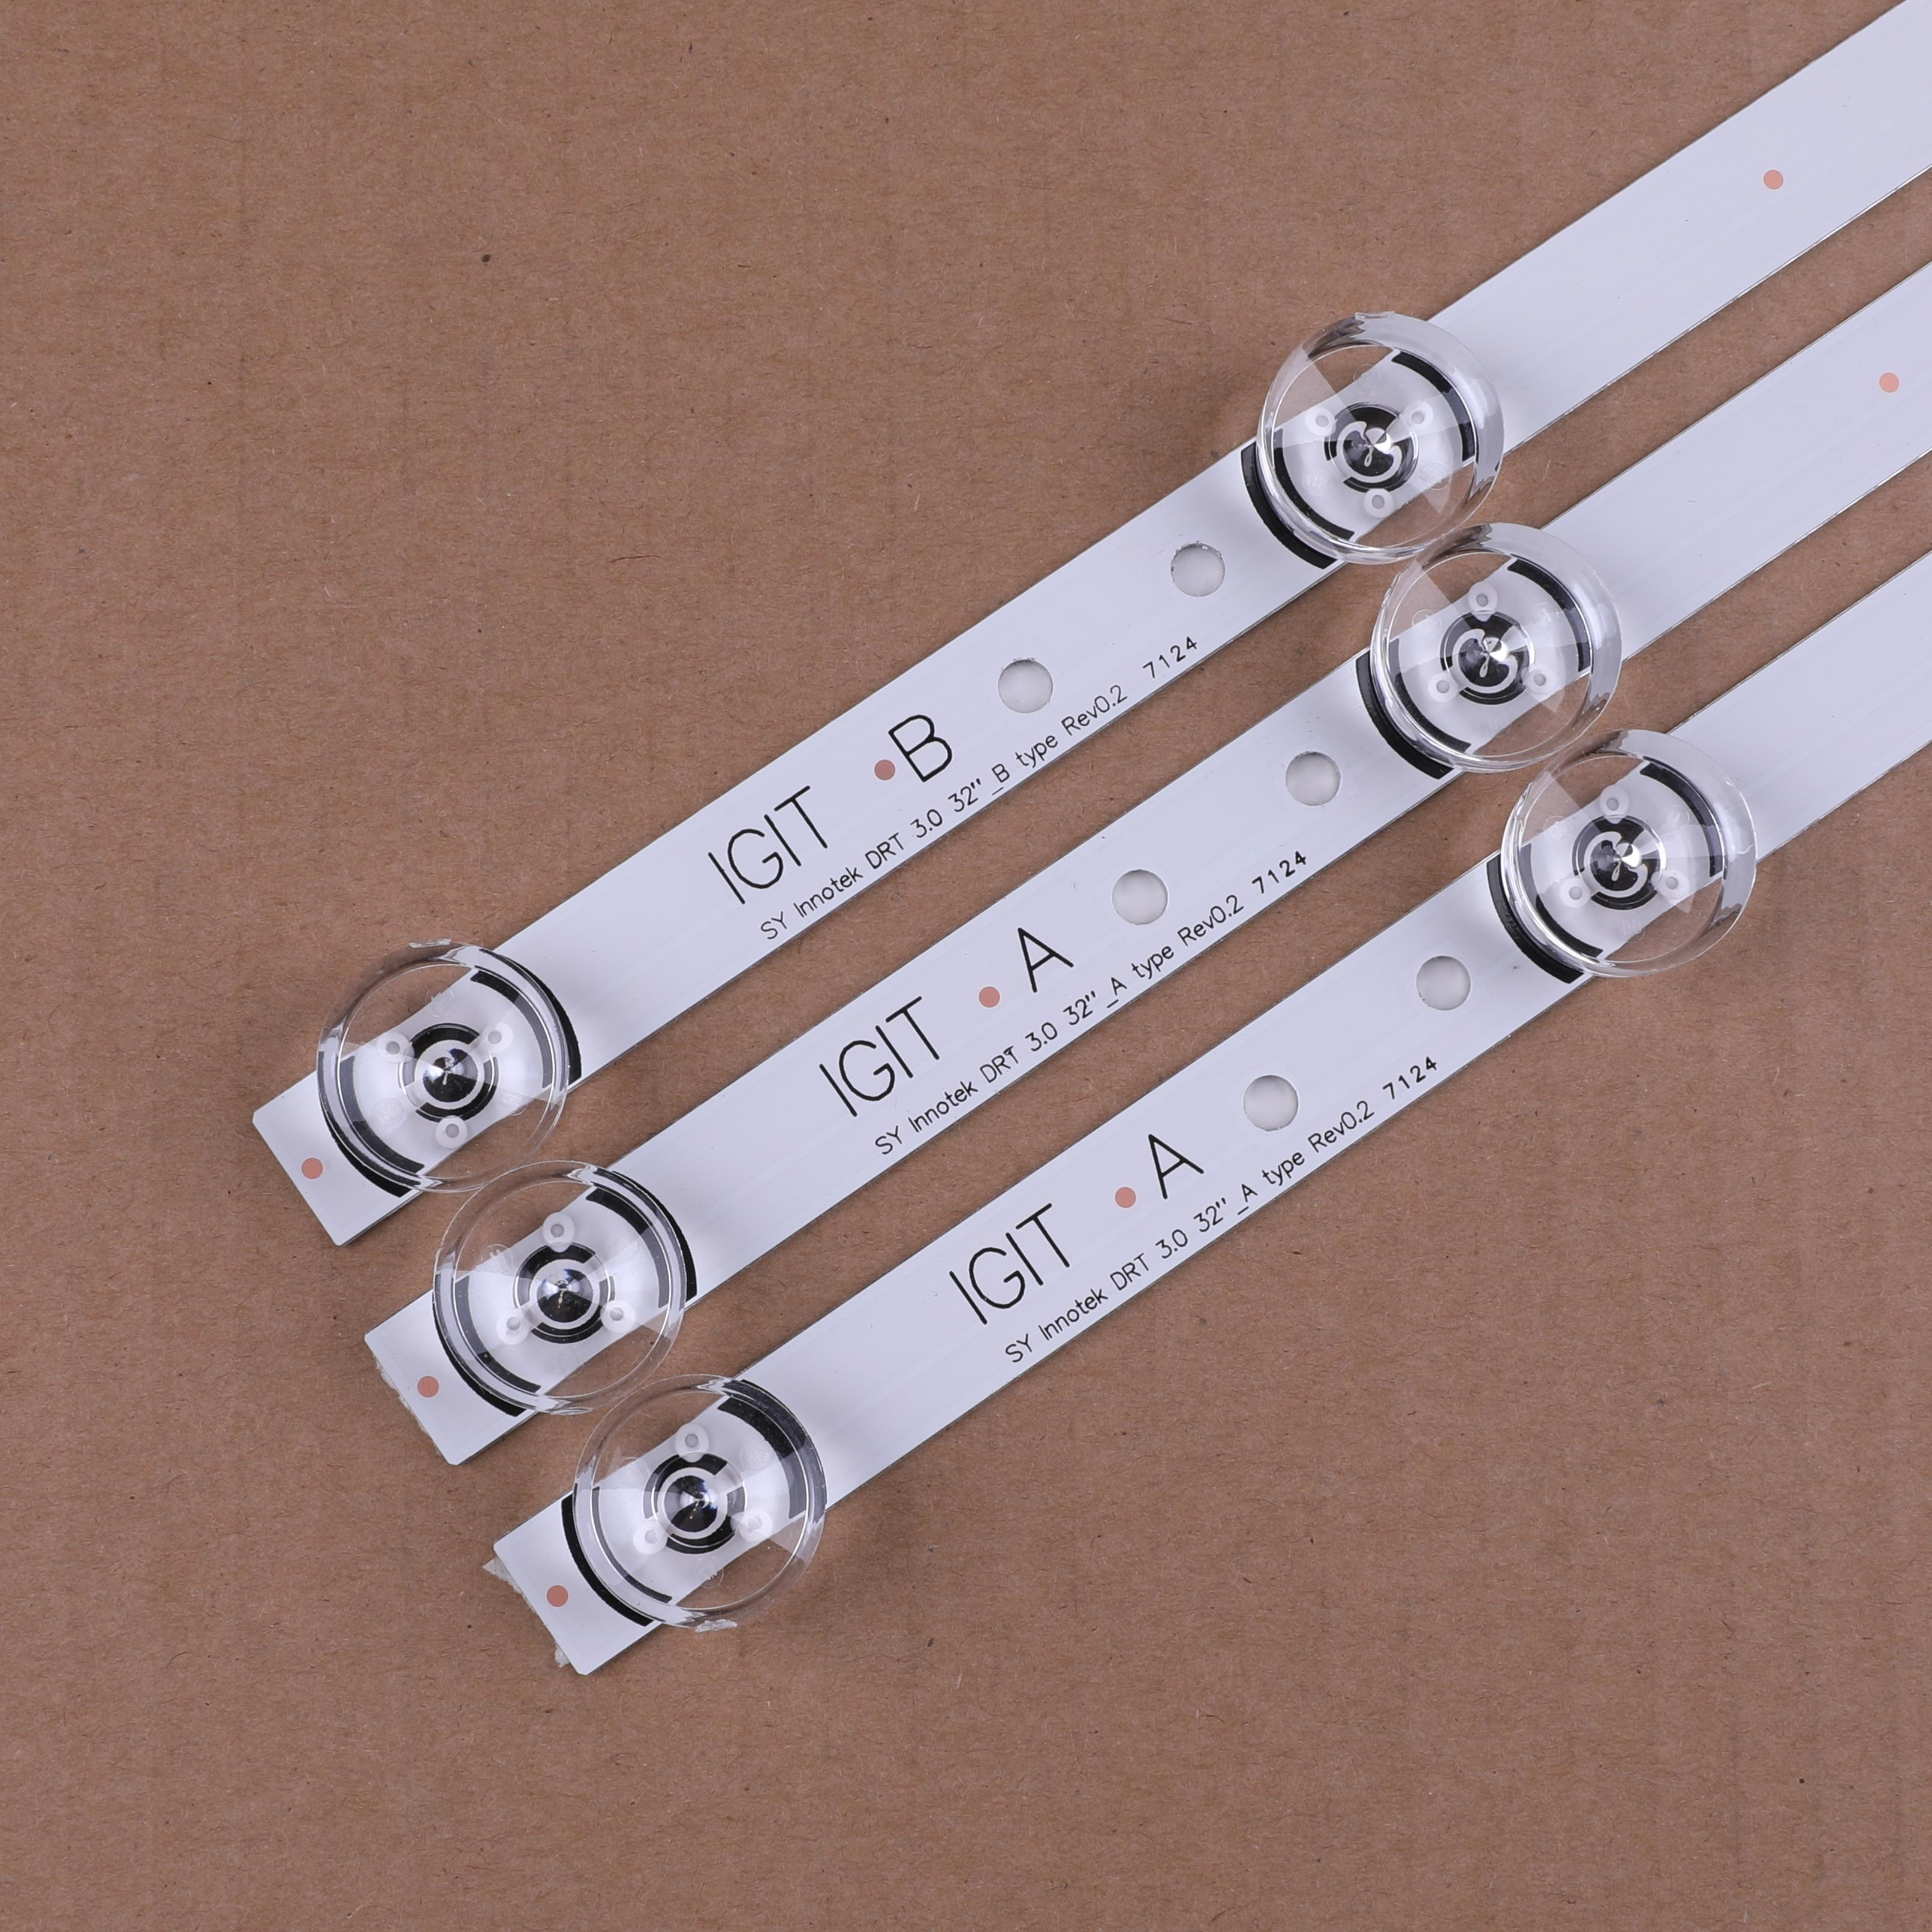 6pcs 59cm retroiluminação LED LEDs para LG innotek 6 drt 3.0 32